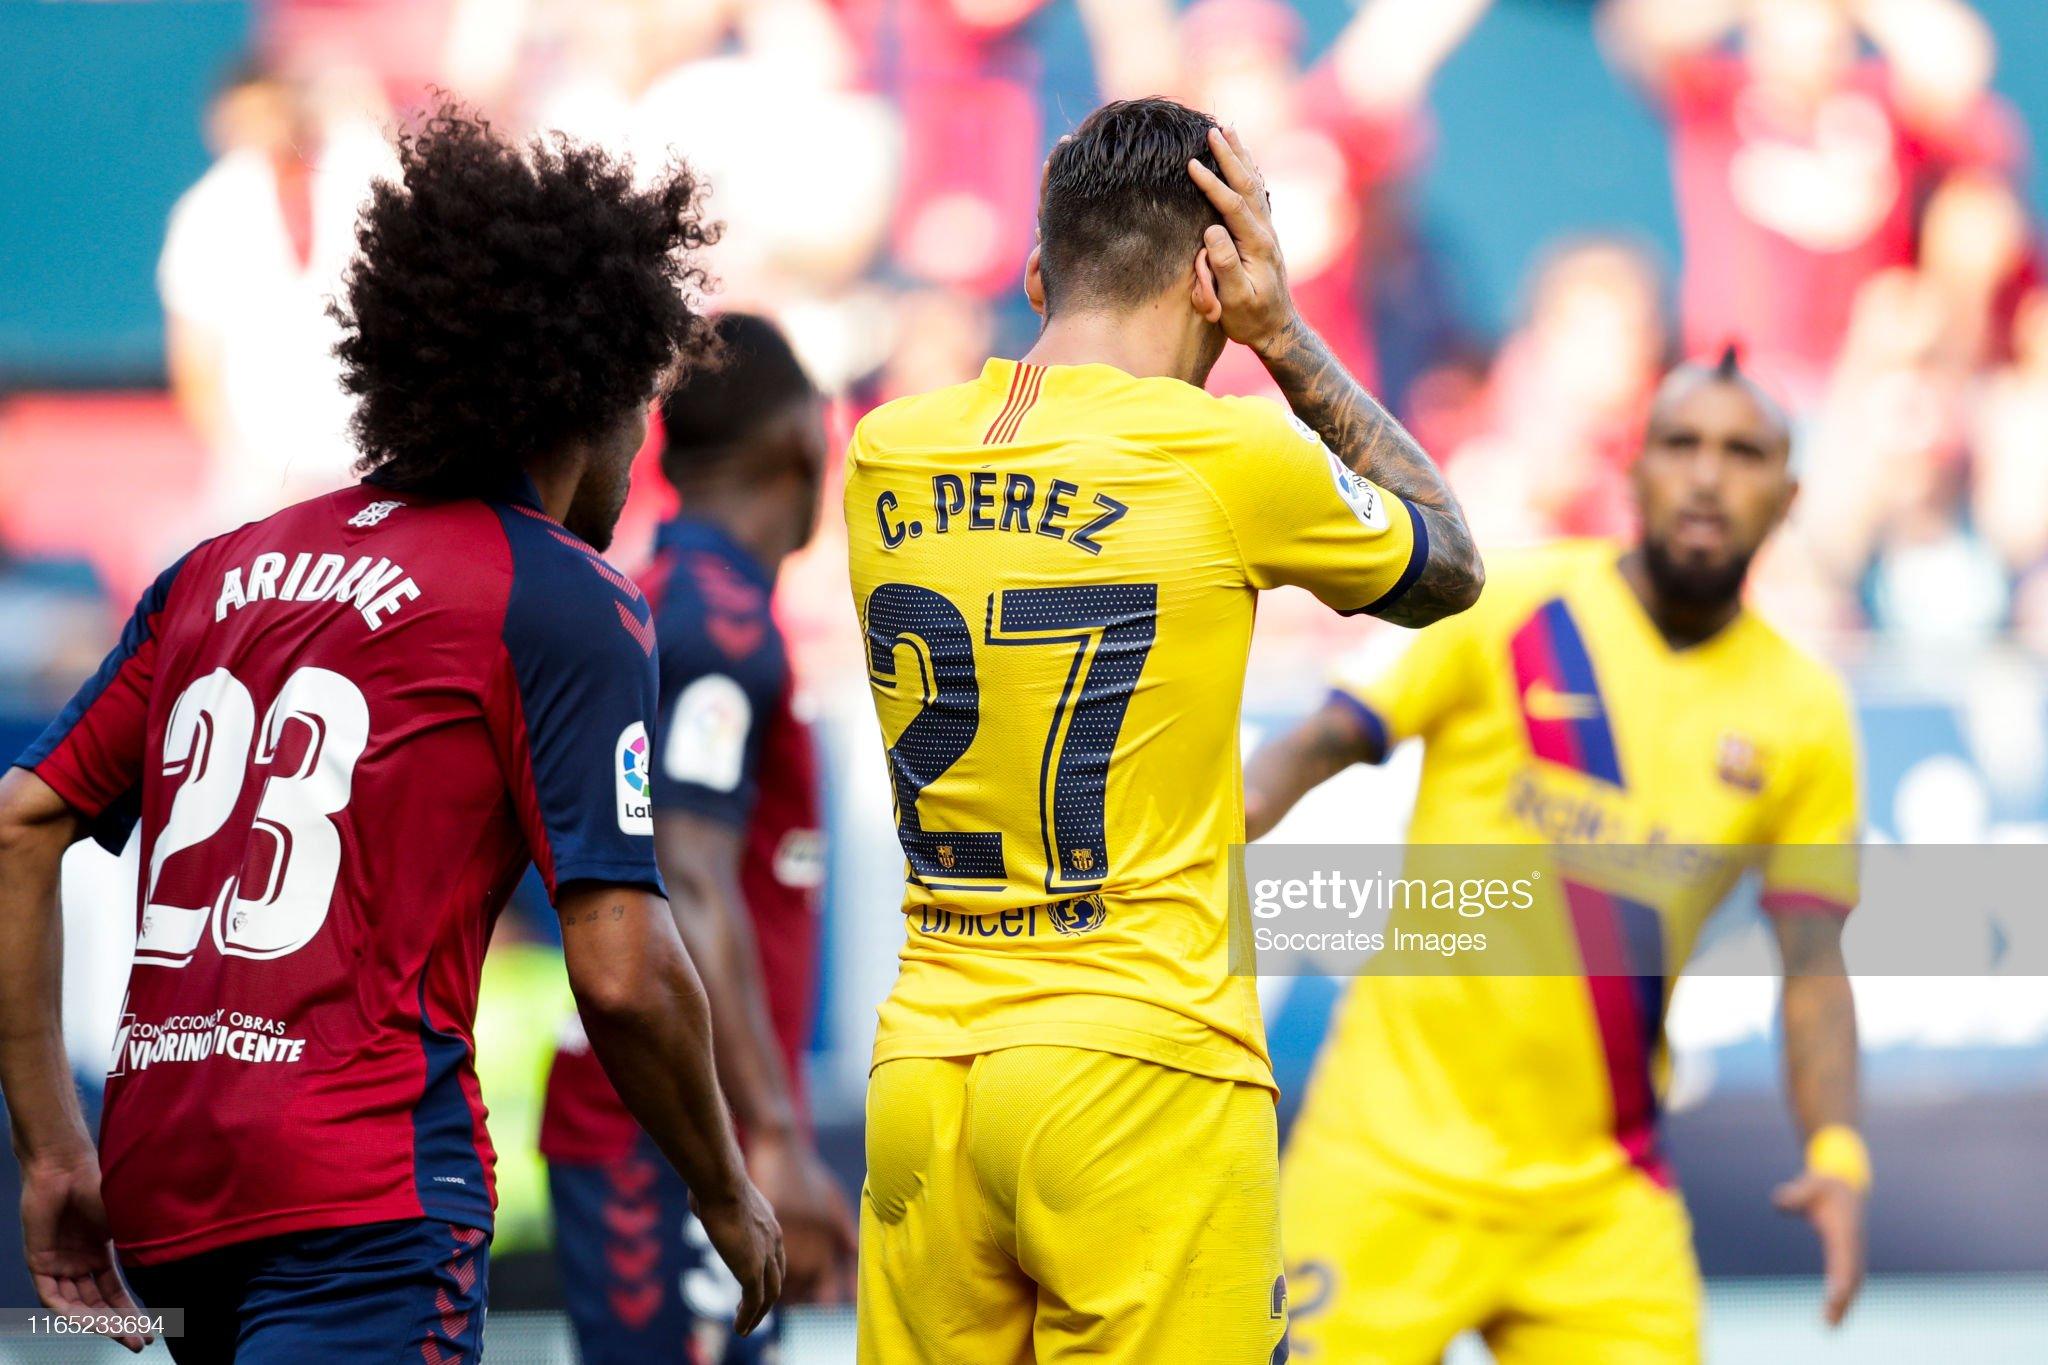 صور مباراة : أوساسونا - برشلونة 2-2 ( 31-08-2019 )  Carles-perez-of-fc-barcelona-during-the-la-liga-santander-match-v-picture-id1165233694?s=2048x2048